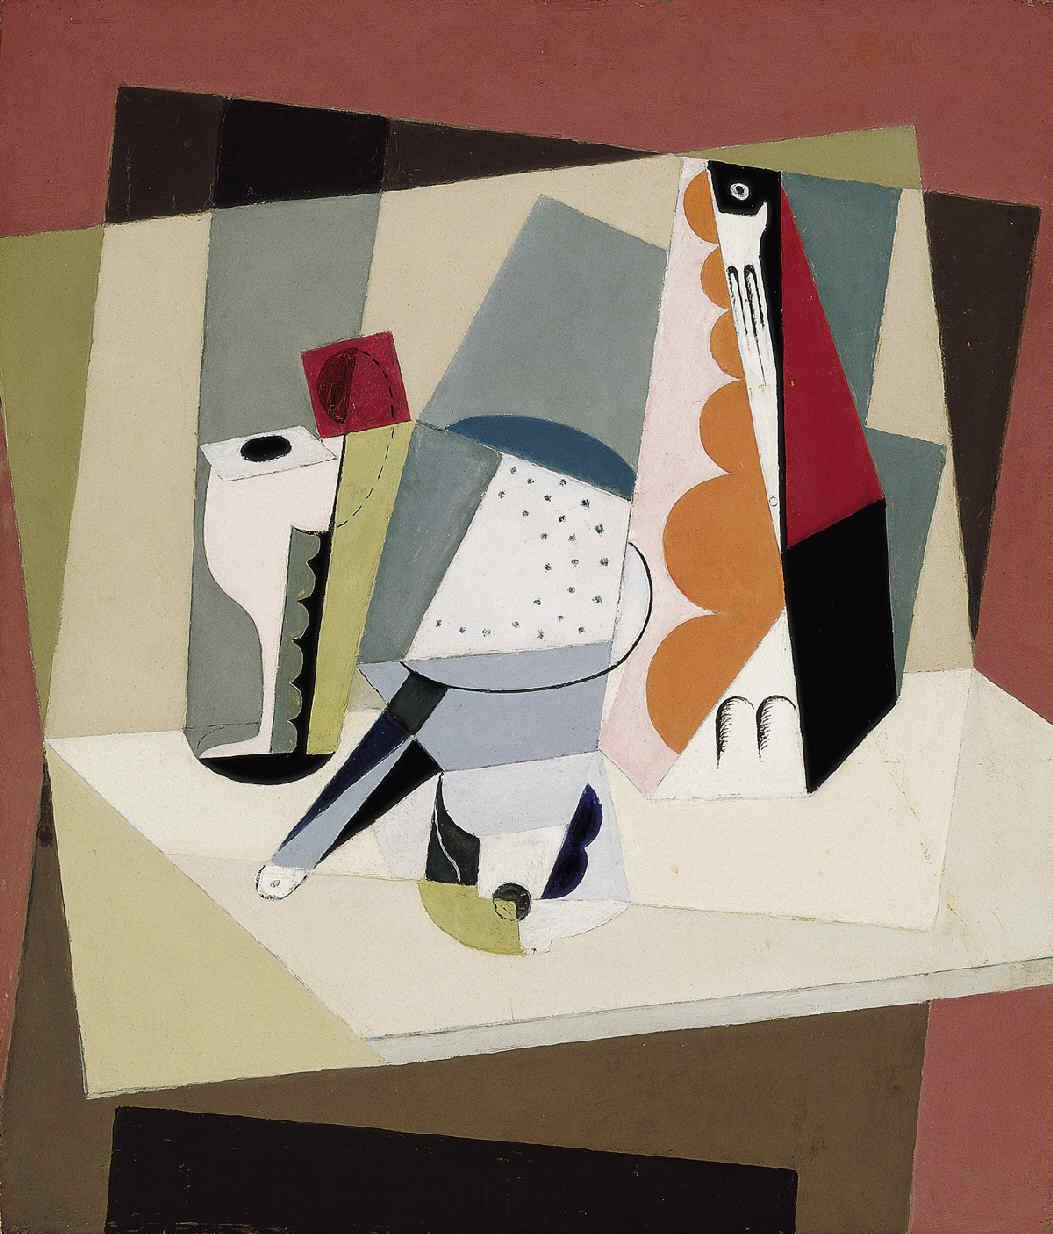 BLANCHARD, María, <i>Nature morte cubiste</i>